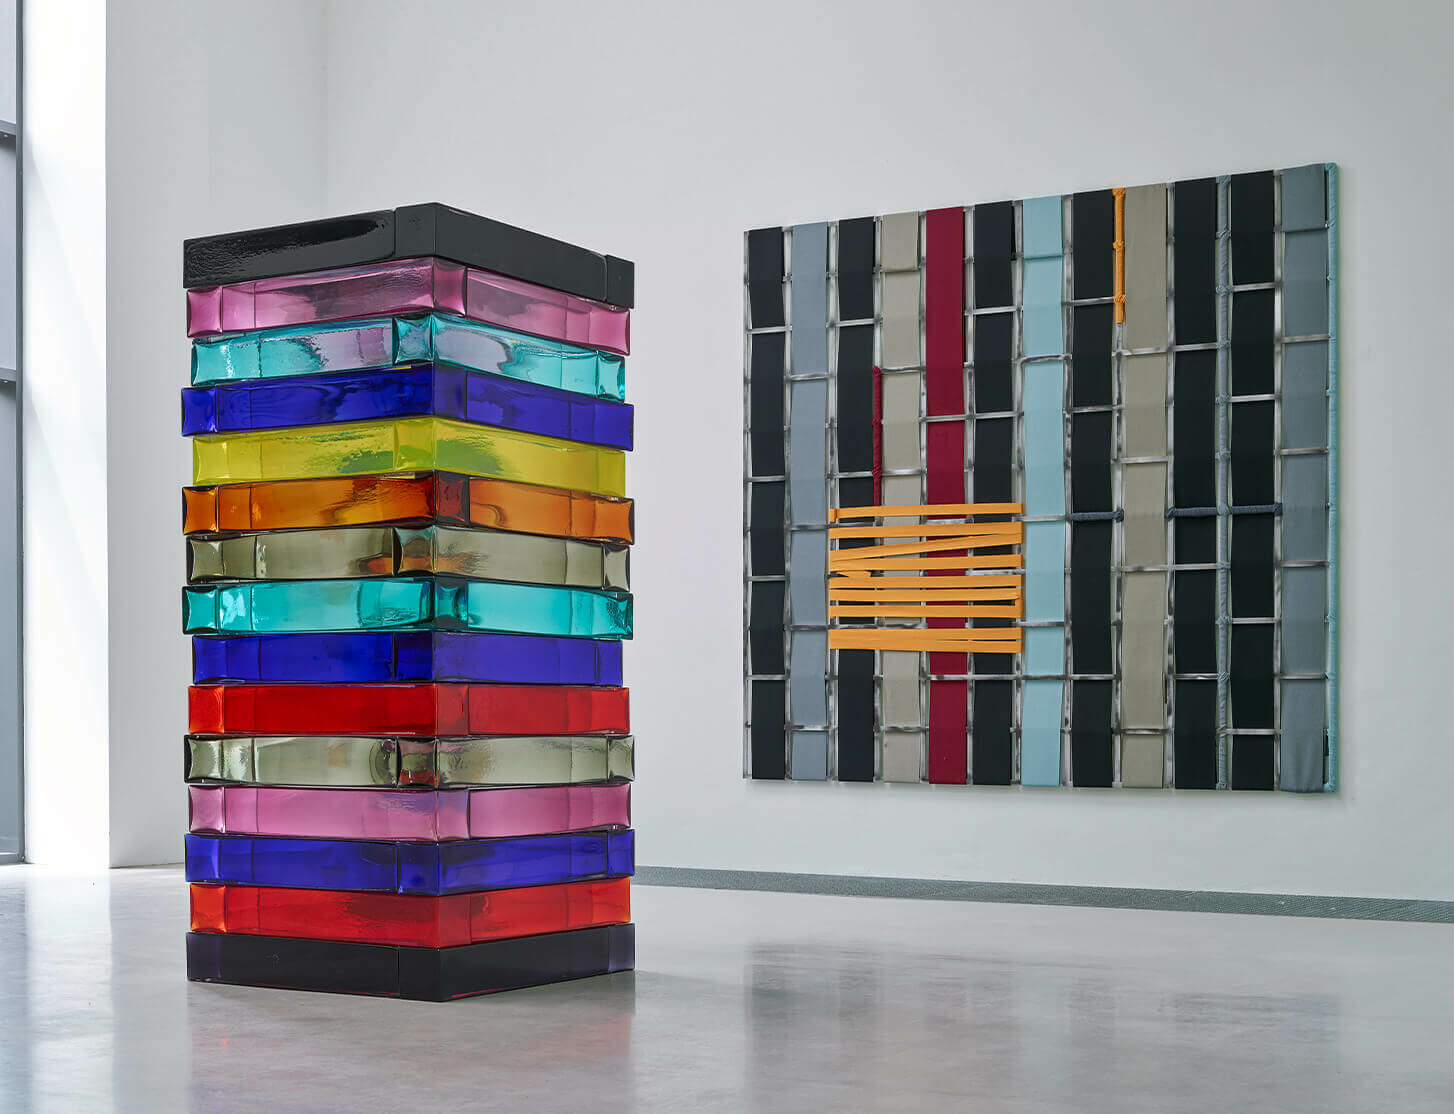 Sean Scully solo exhibition opens at Skulpturenpark Waldfrieden